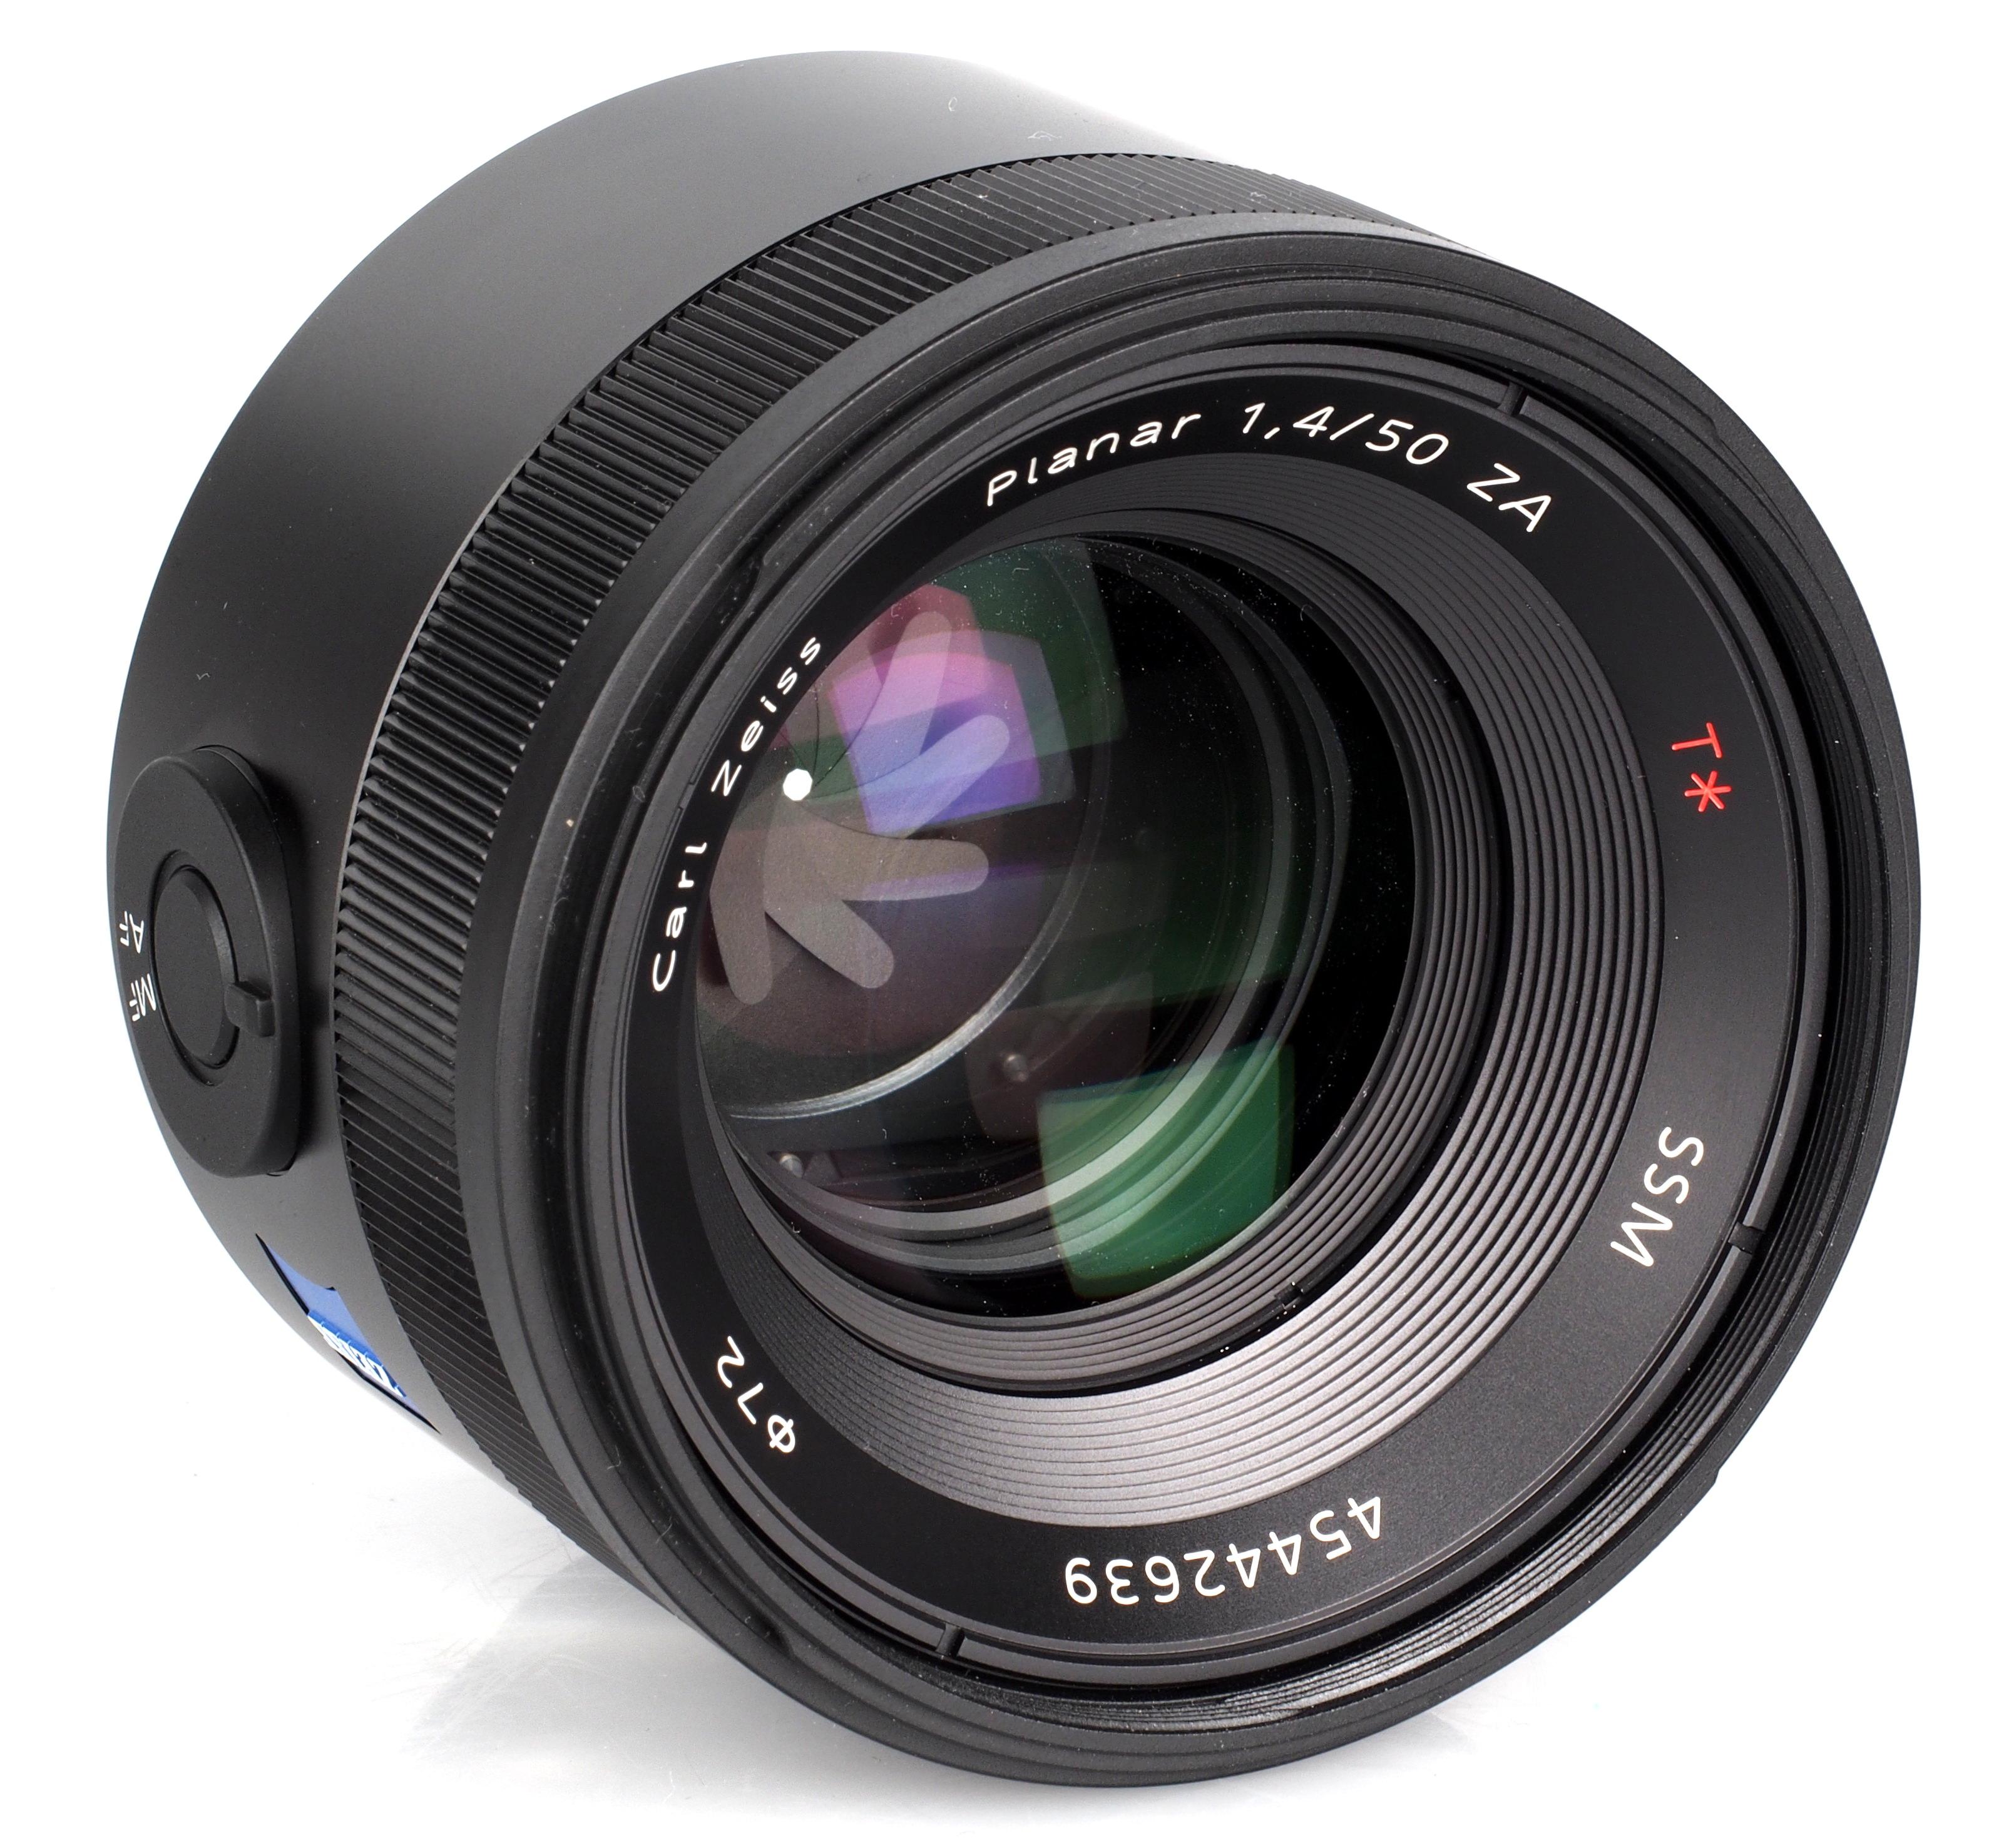 Top 23 best 50mm prime lenses 2017 - Best lens for interior design photography ...